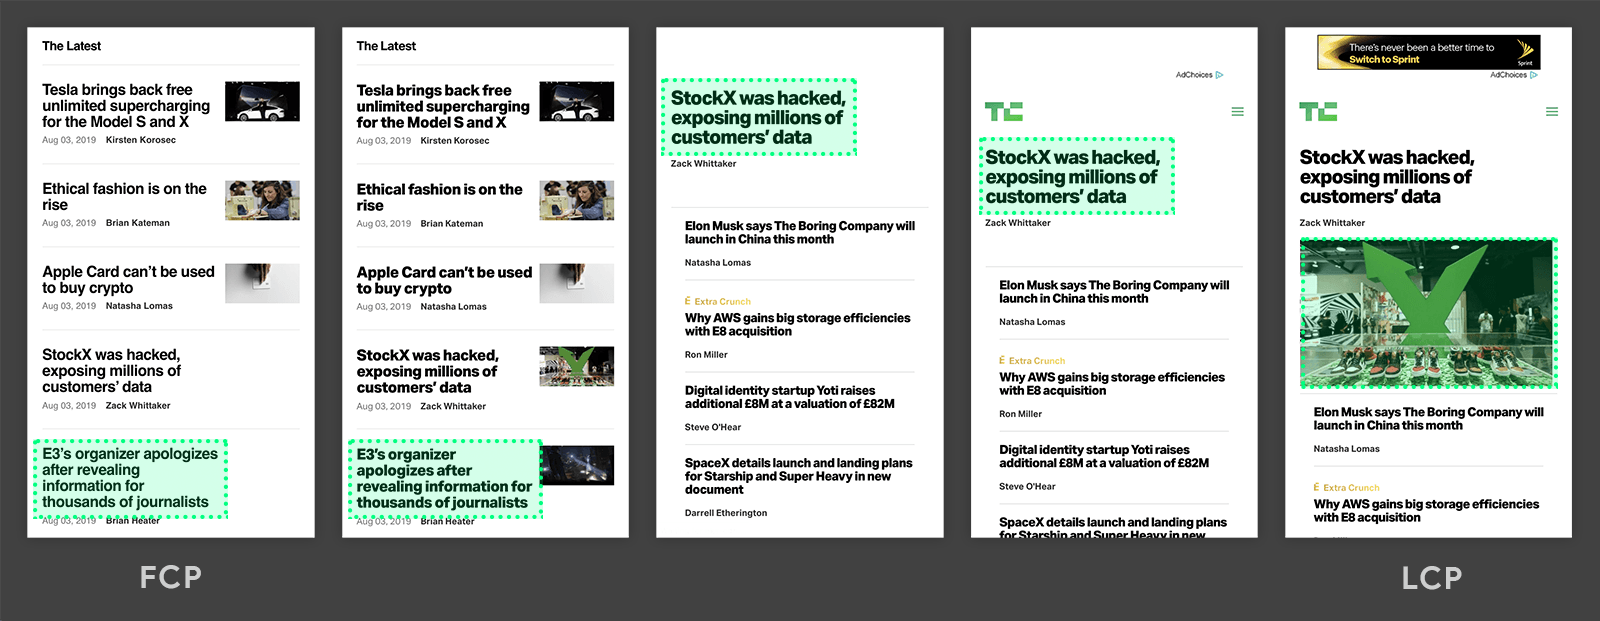 Largest Contentful Paint timeline from techcrunch.com